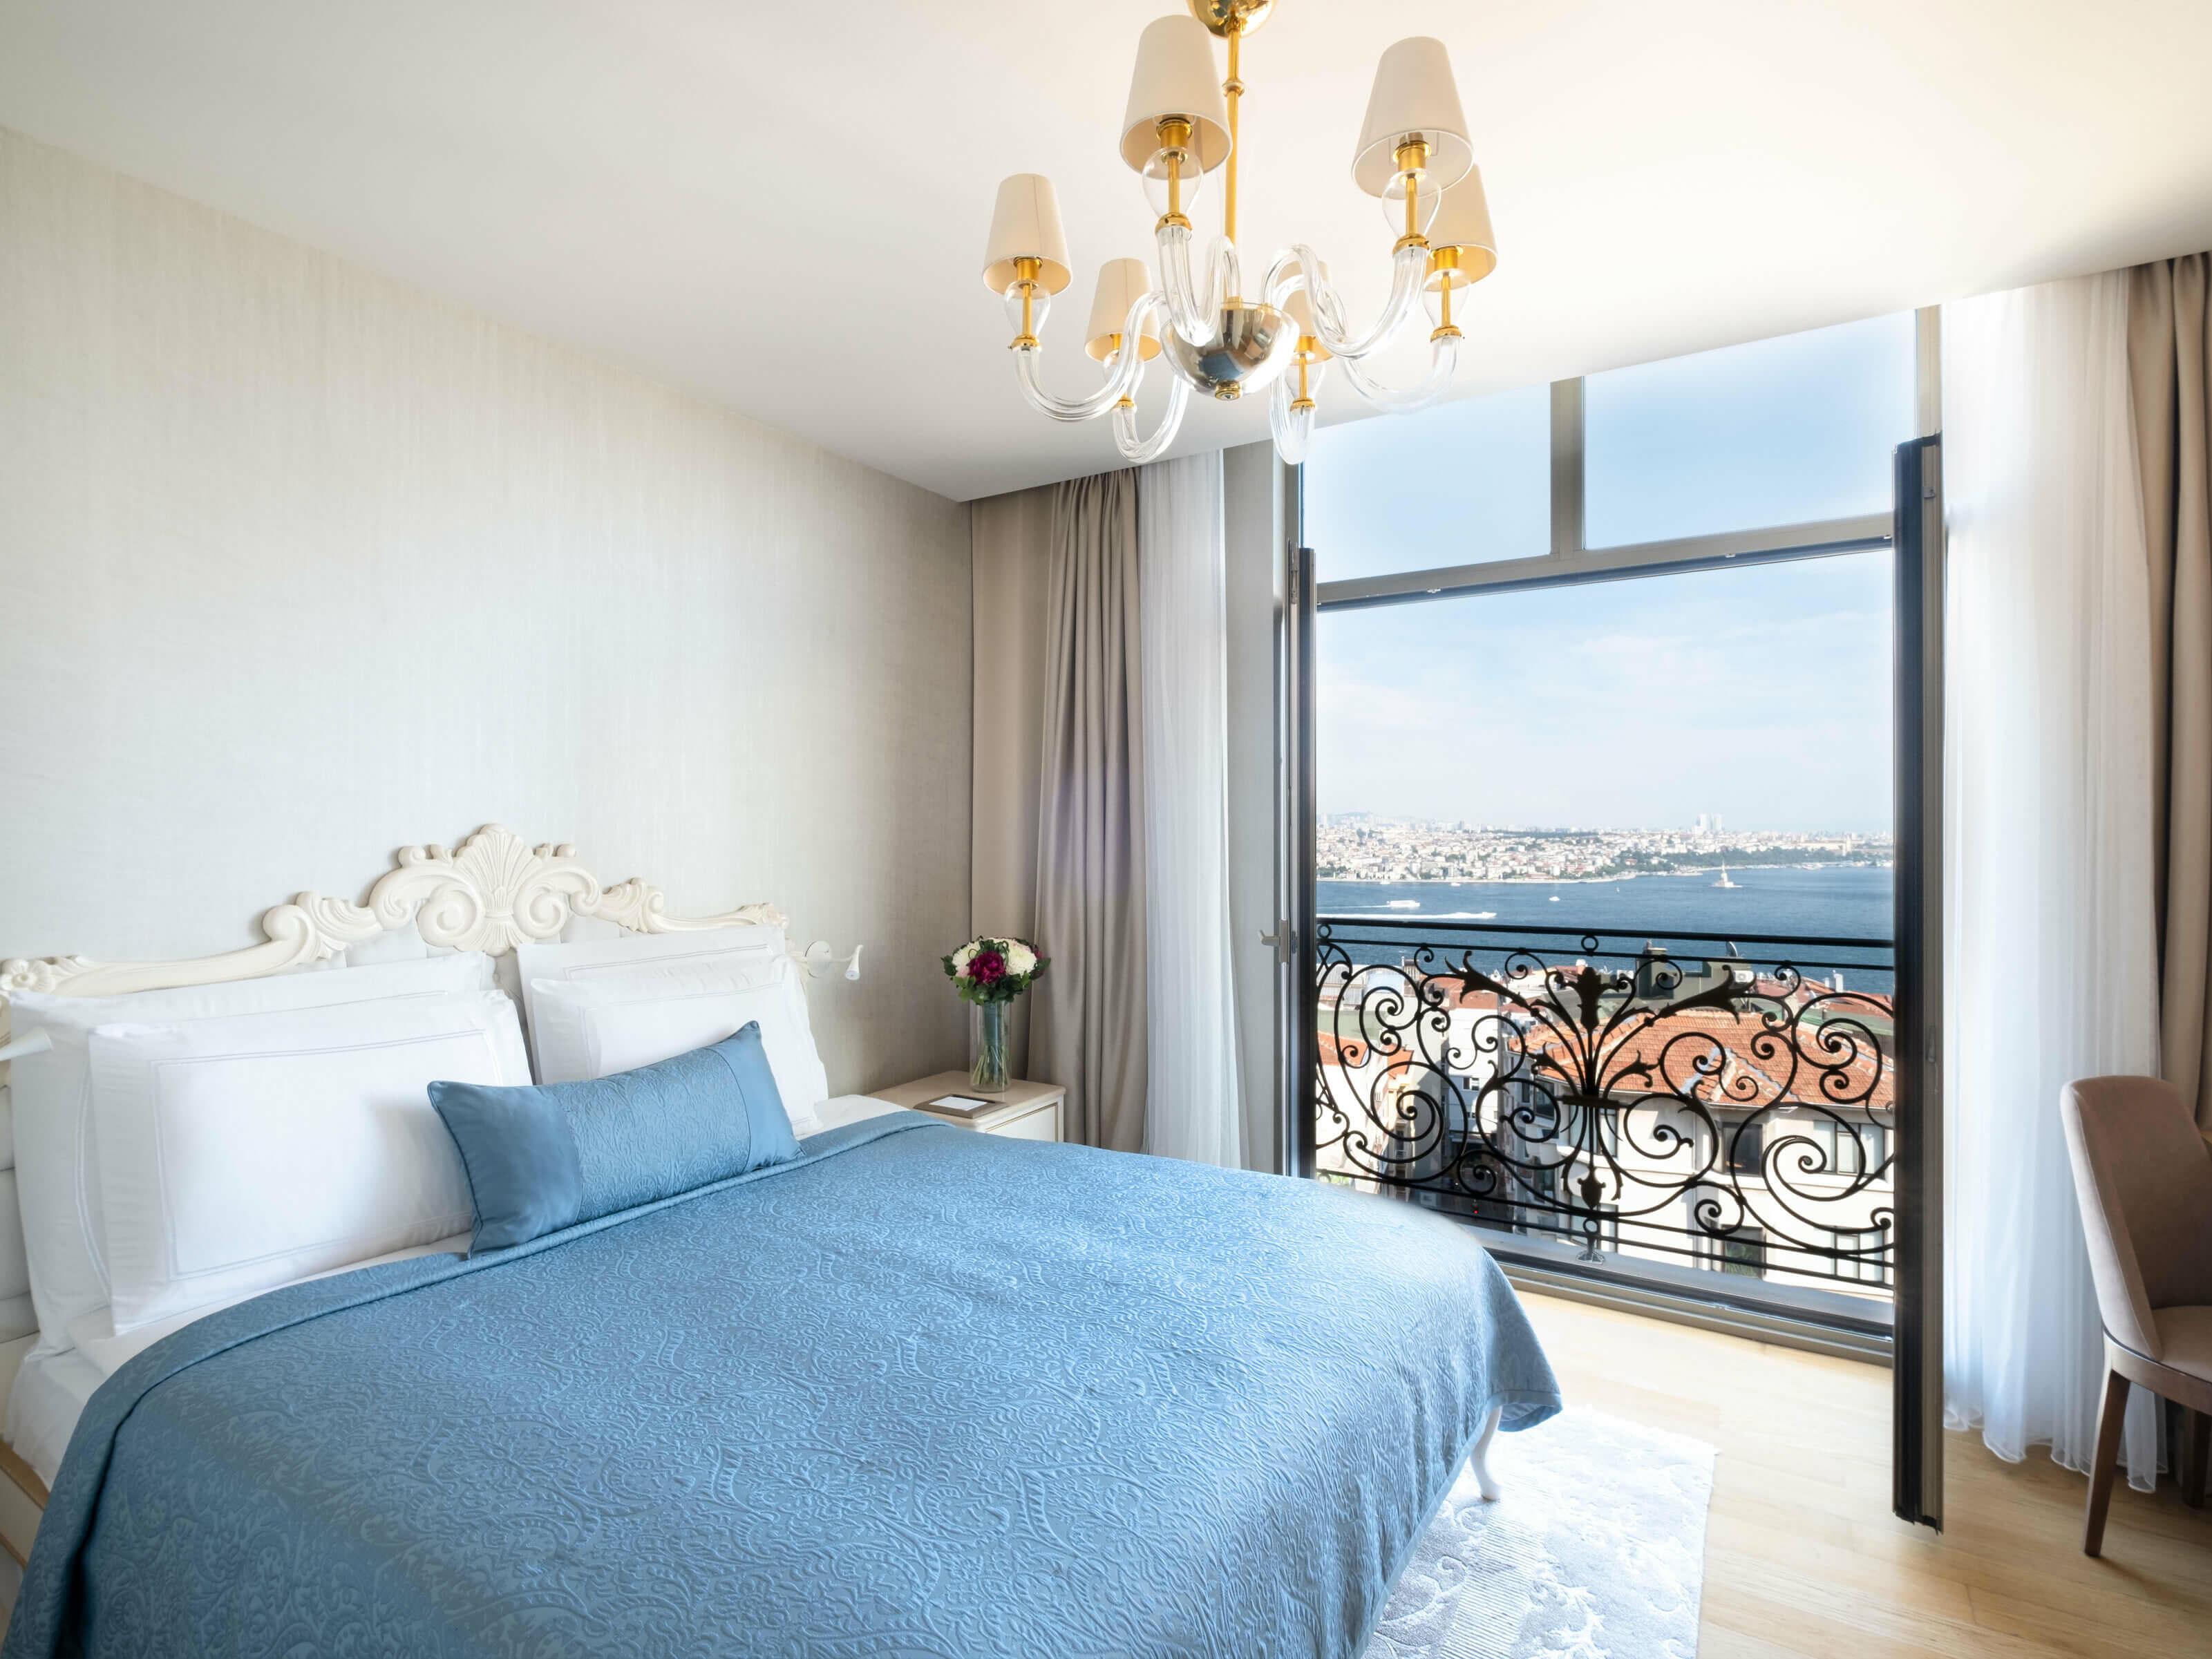 Executive Bosphorus Suite CVK Park Bosphorus Hotel İstanbul